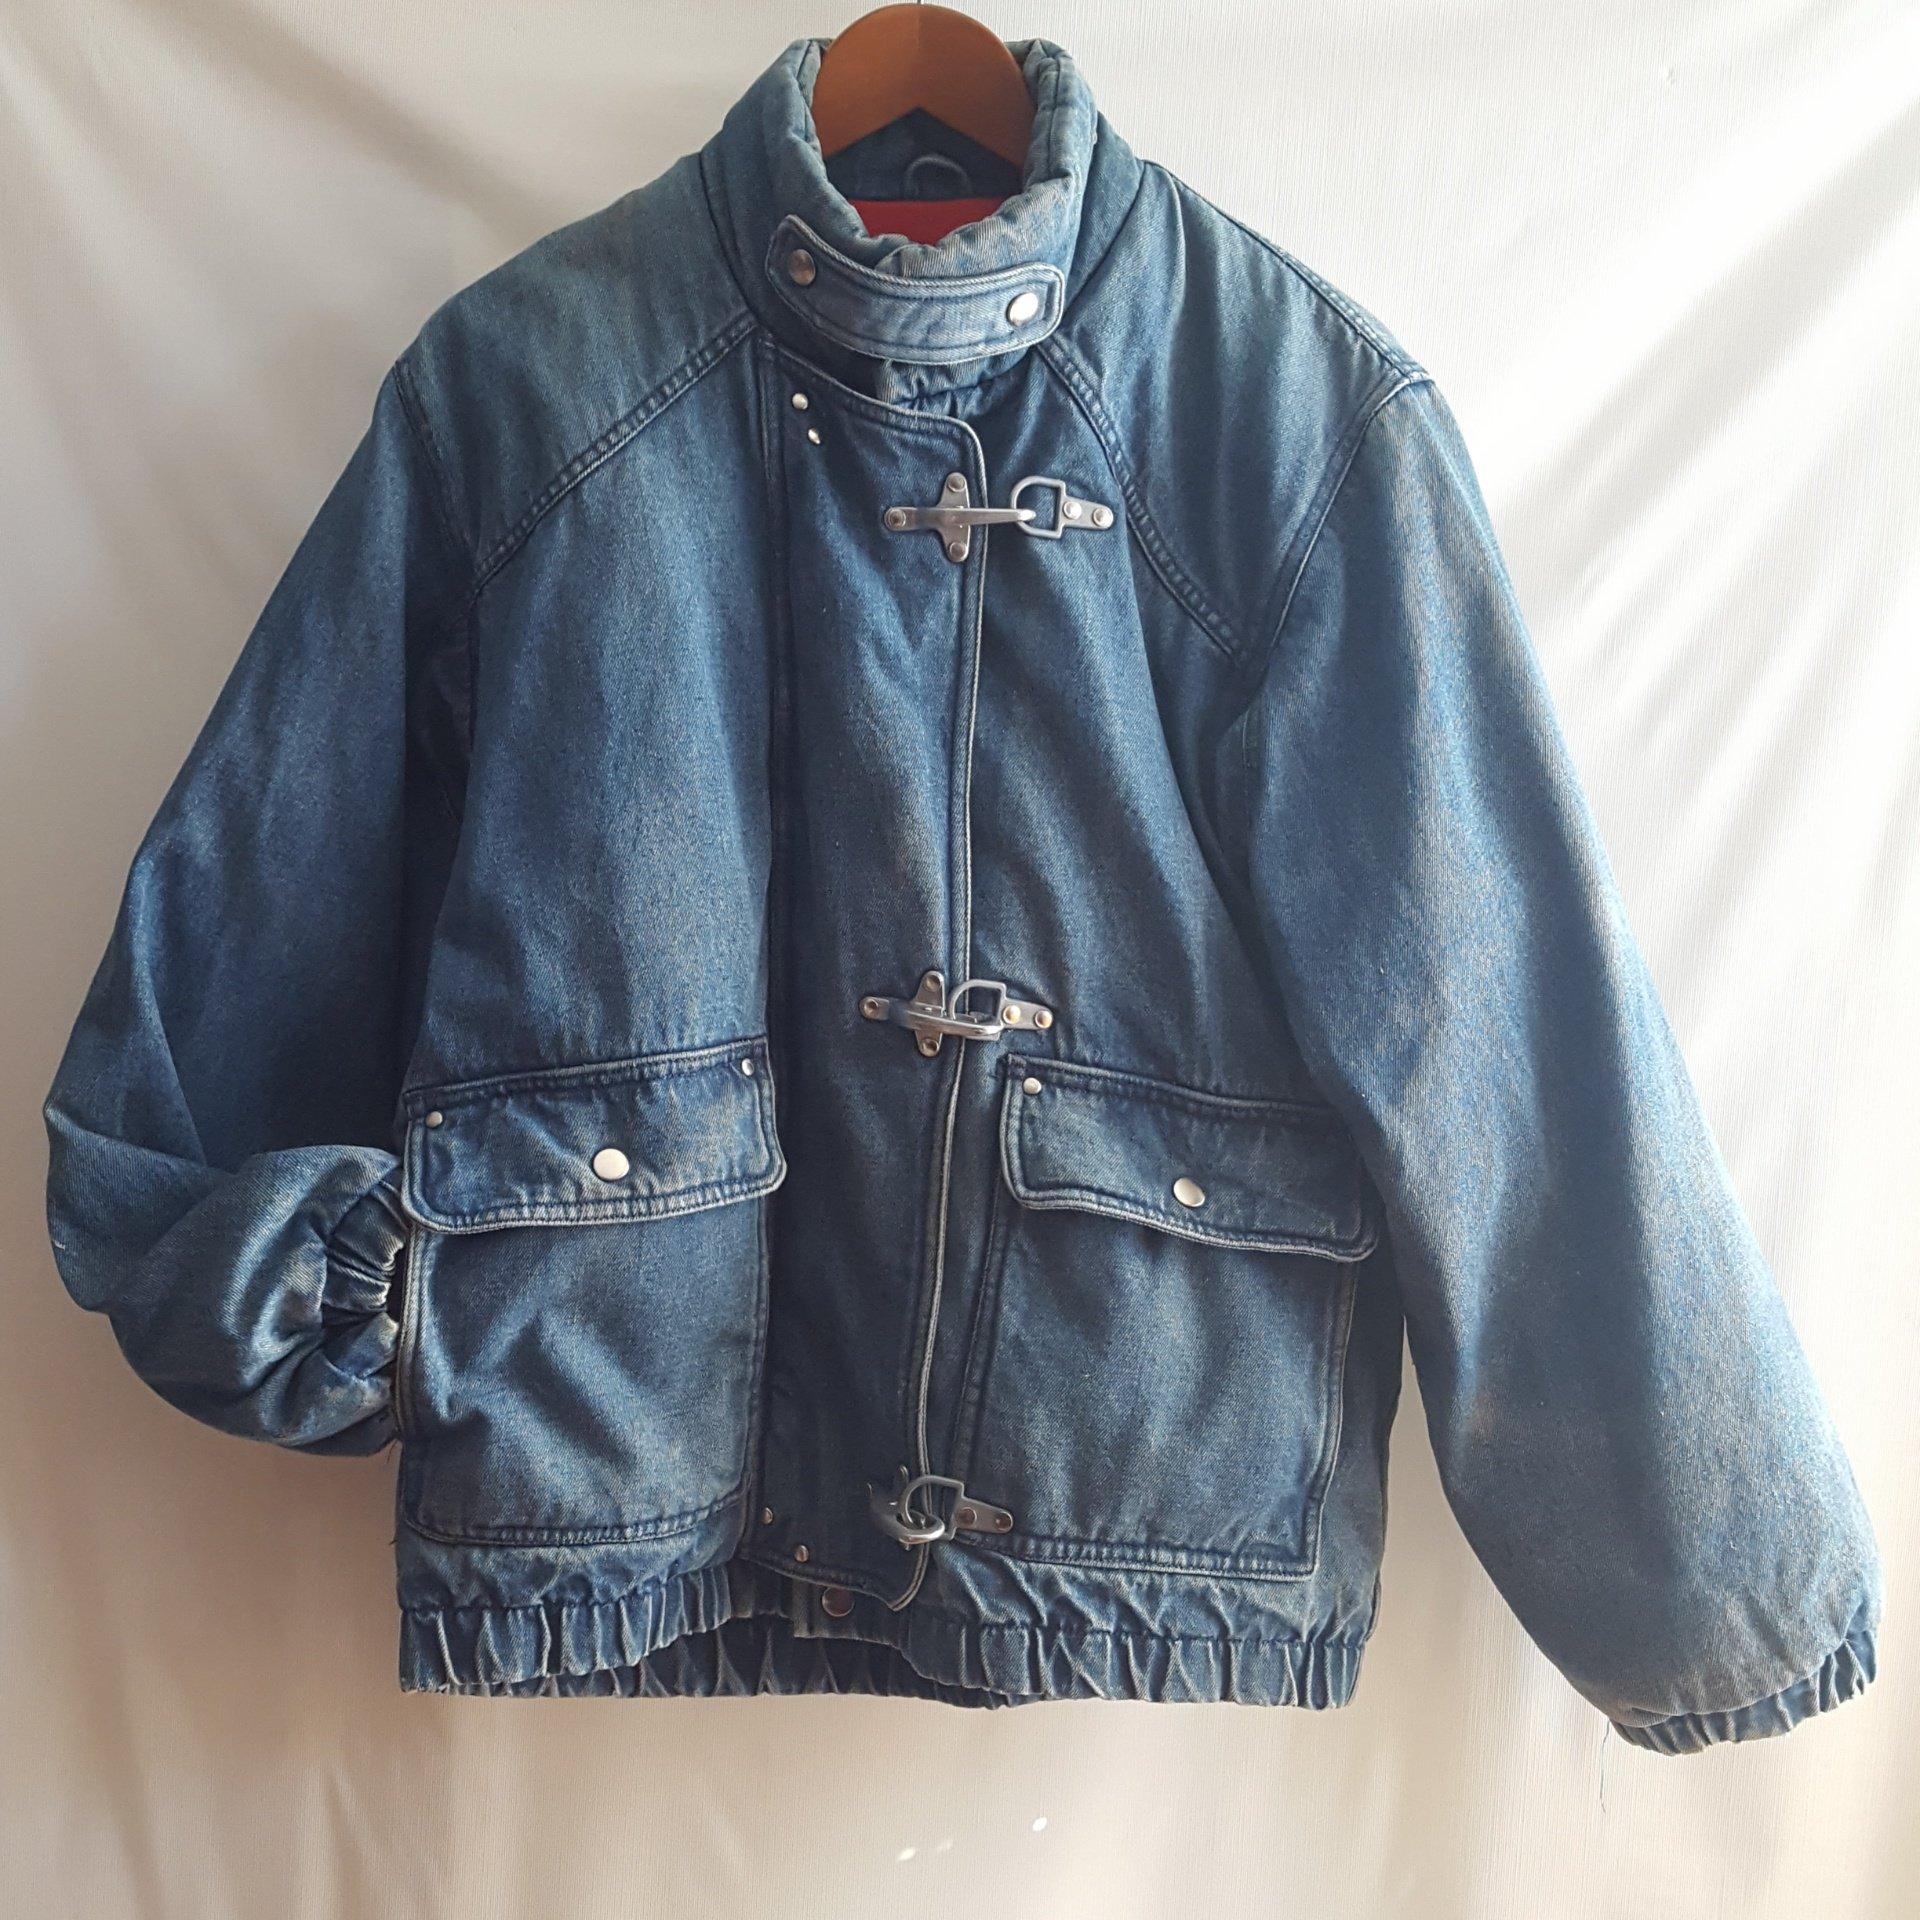 KRAZY KRINKLE By Saxton Hall Vintage Denim Down Bomber Jacket Size M